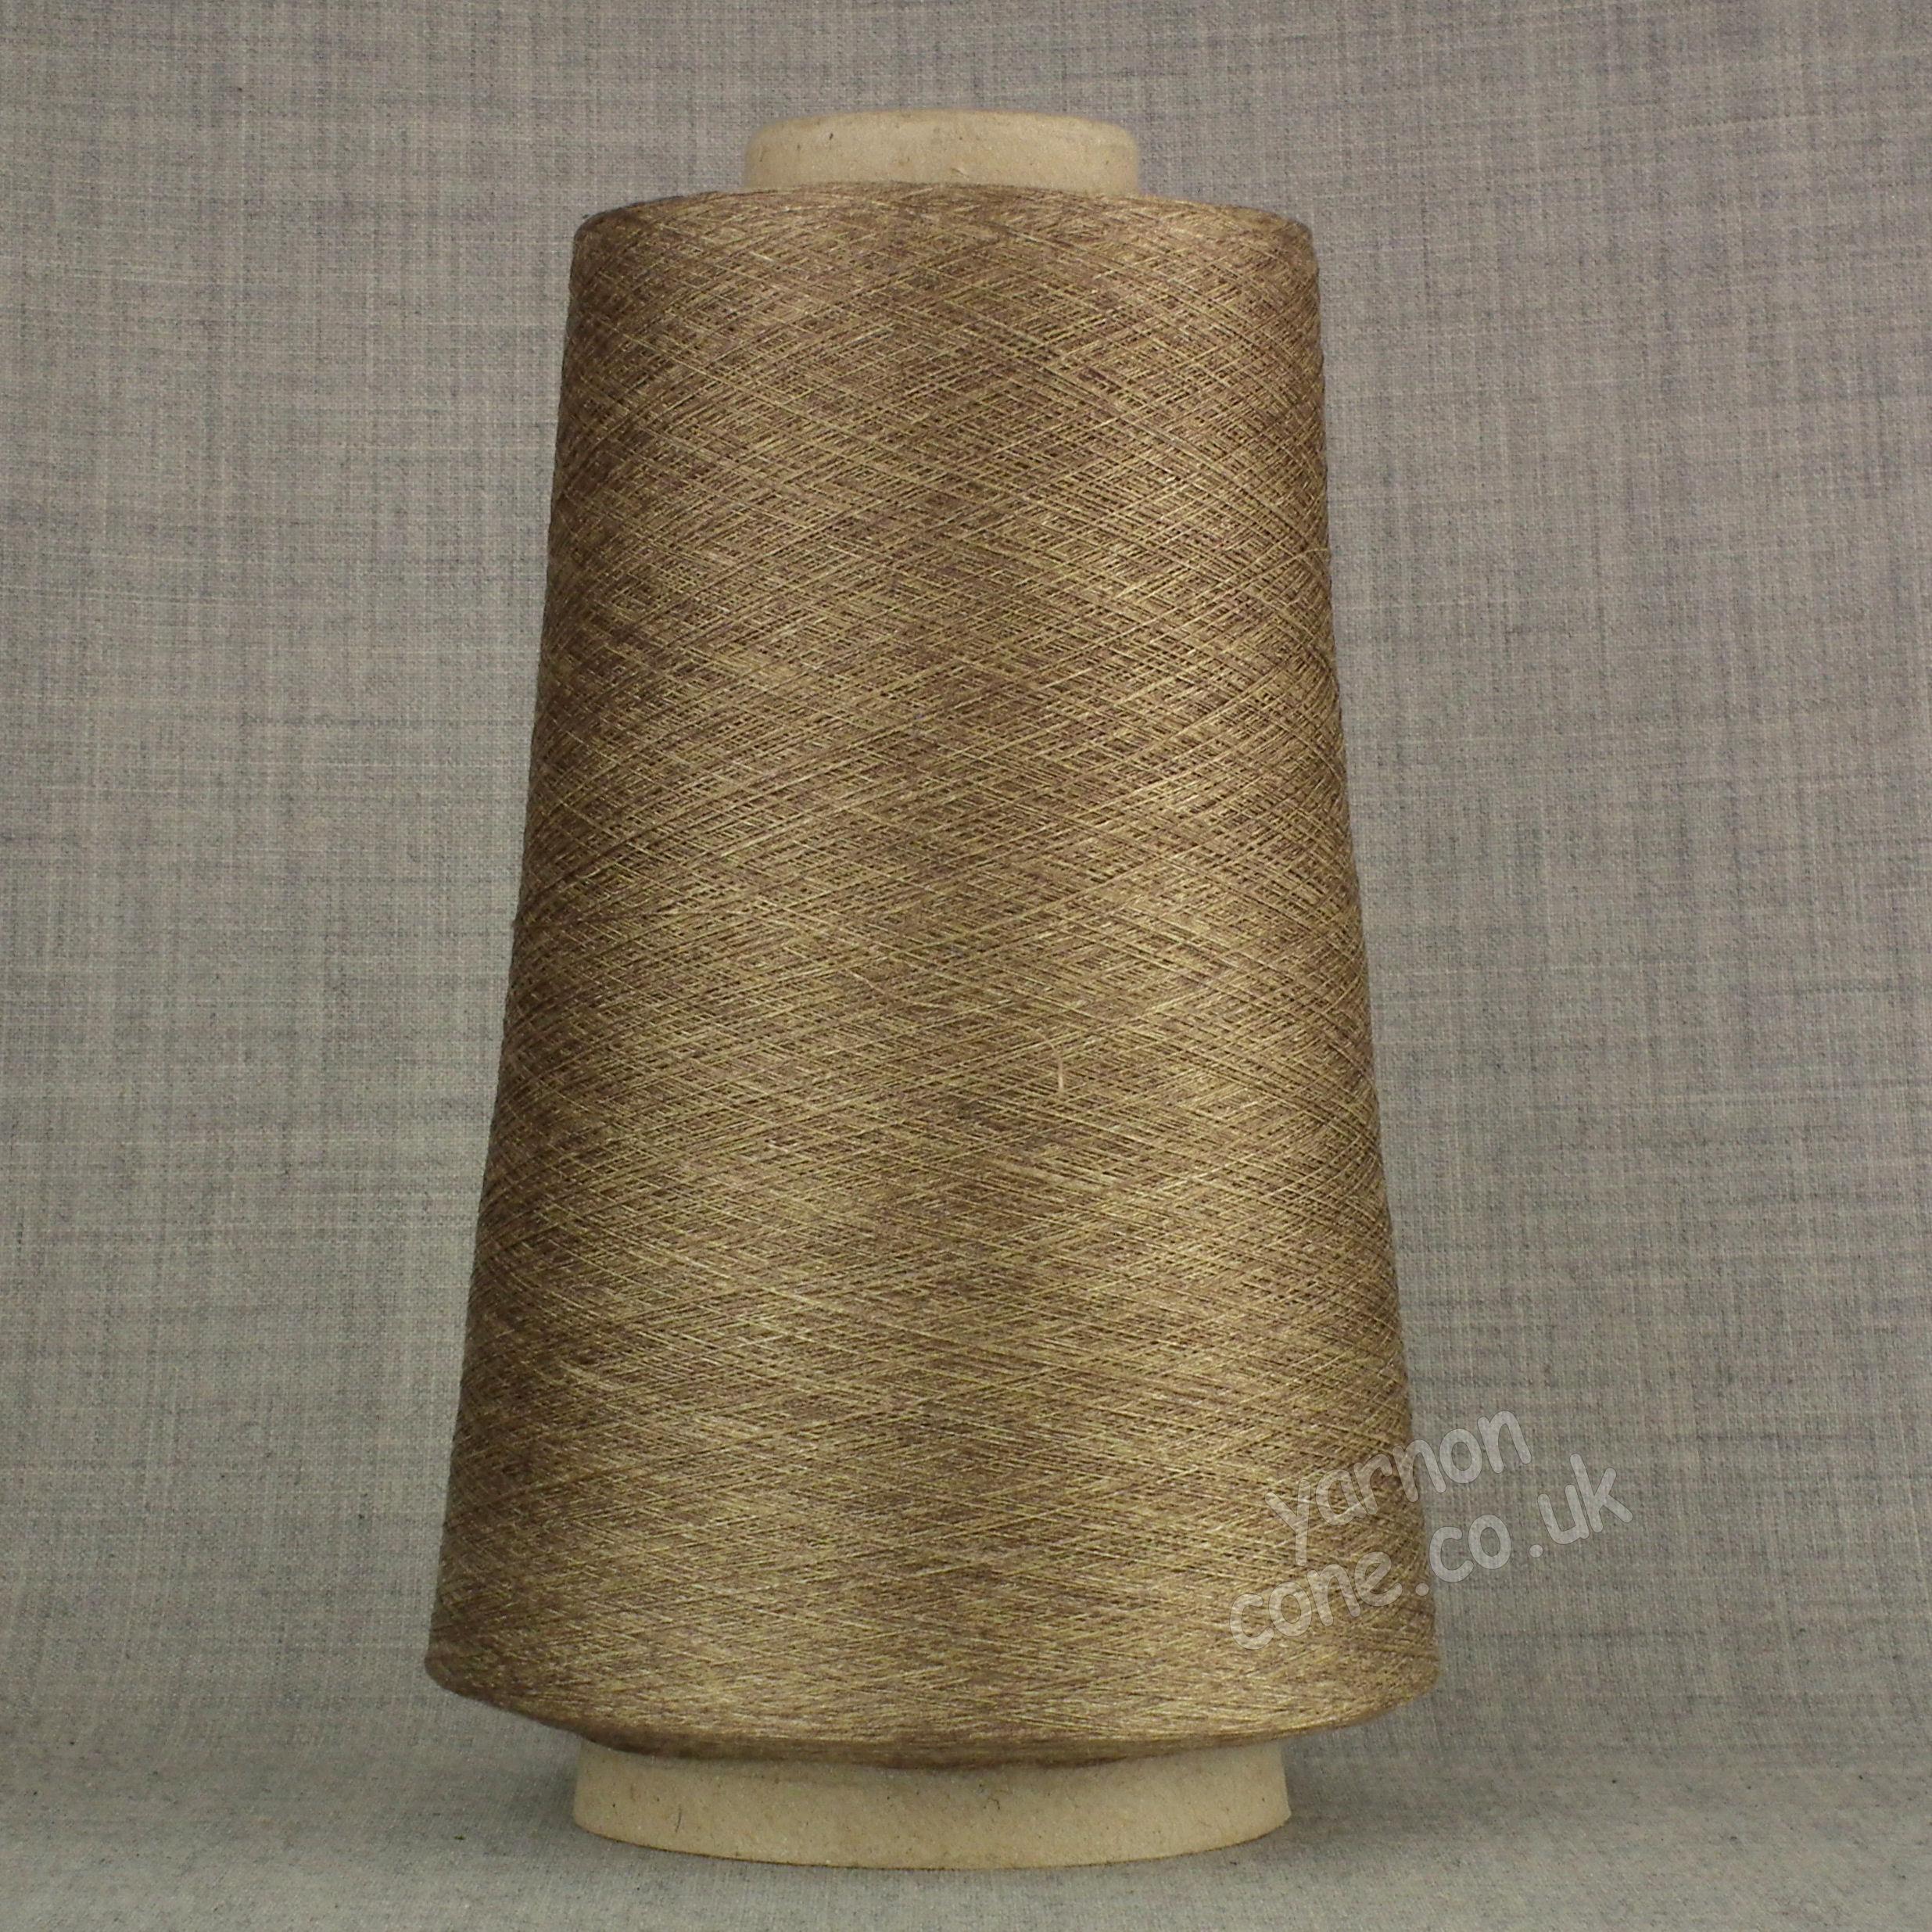 Pure silk cobweb yarn 2/120 NM italian 2/120NM on cone weaving knitting - melange shade